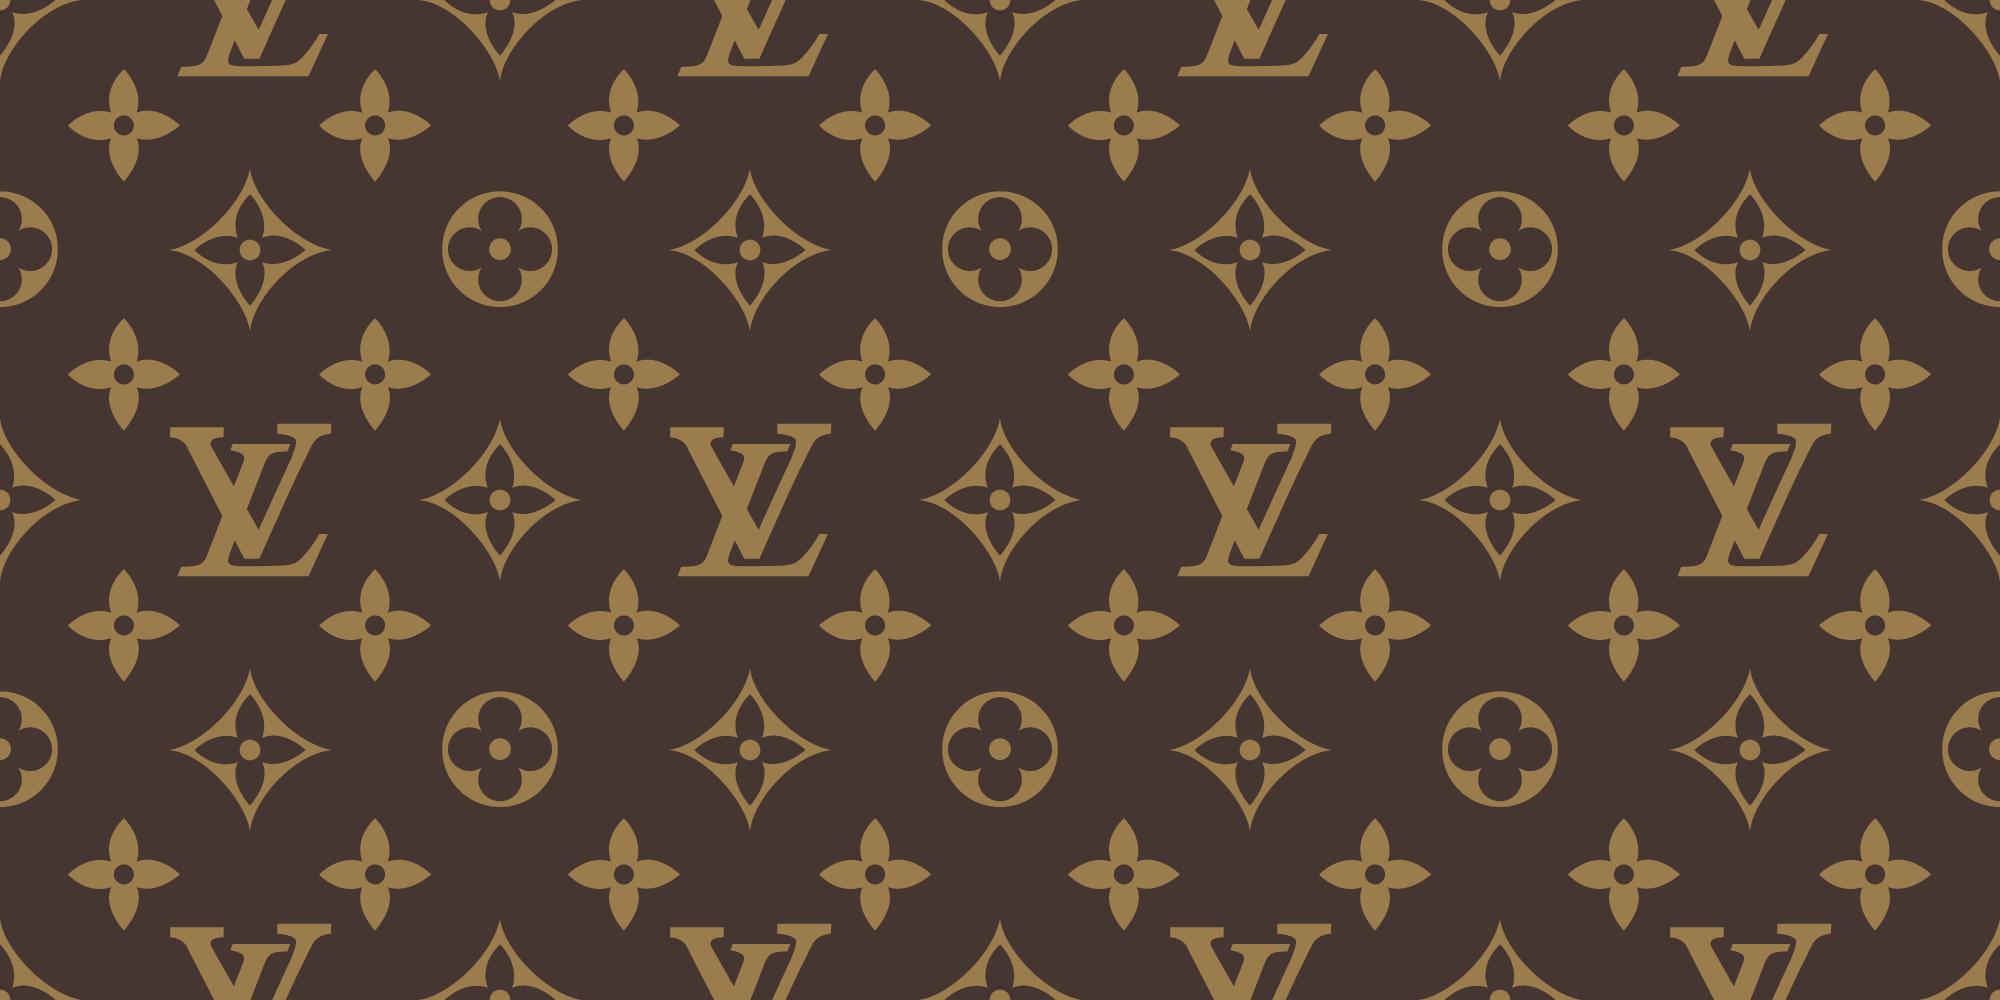 Louis Vuitton Print Wallpapers Top Free Louis Vuitton Print Backgrounds Wallpaperaccess